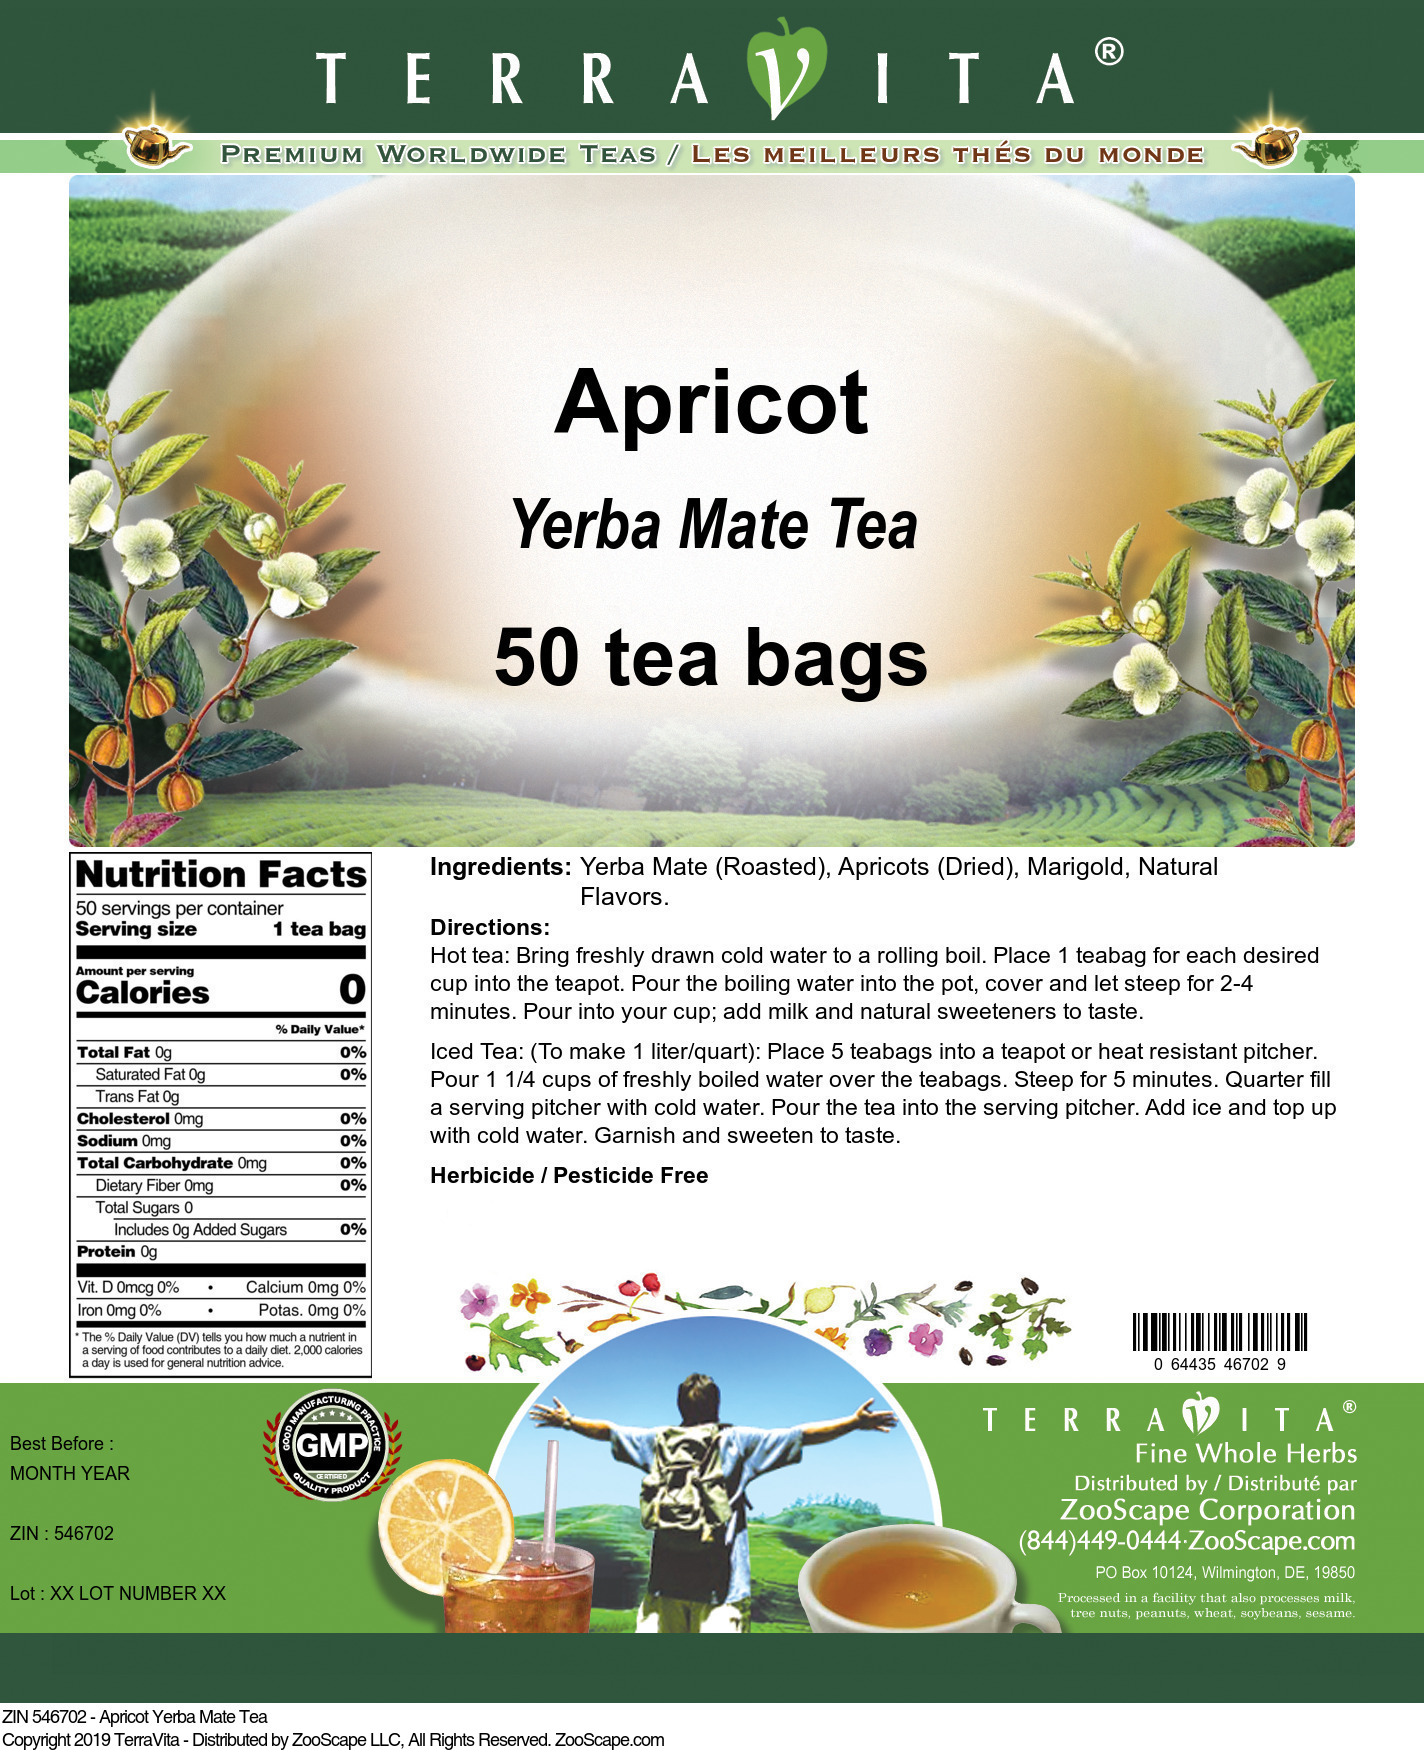 Apricot Yerba Mate Tea